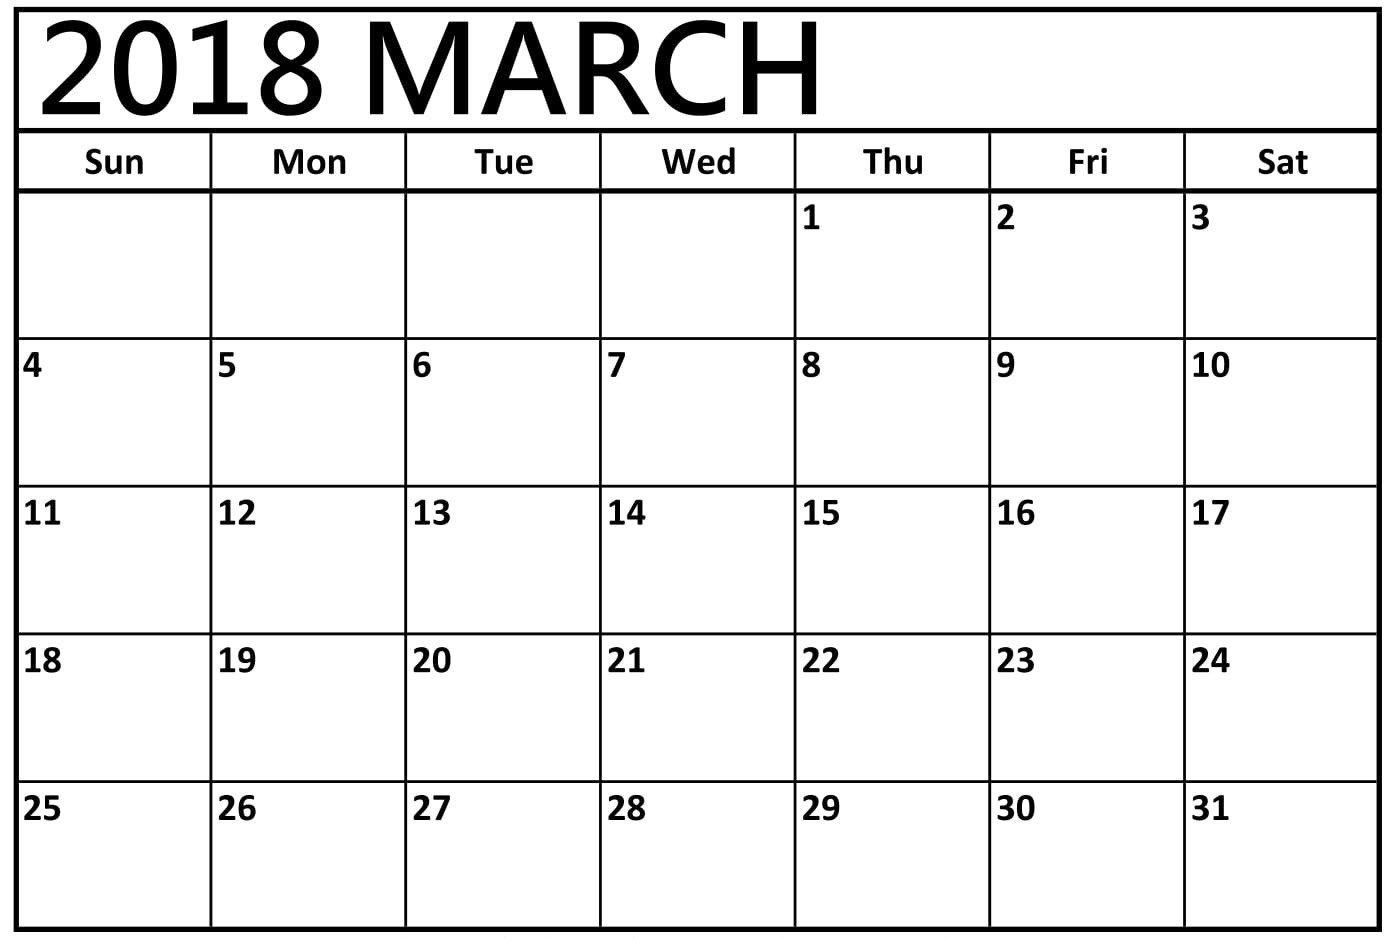 march 2018 calendar march 2018 calendar printable march 2018 calendar template march 2018 calendar pdf https